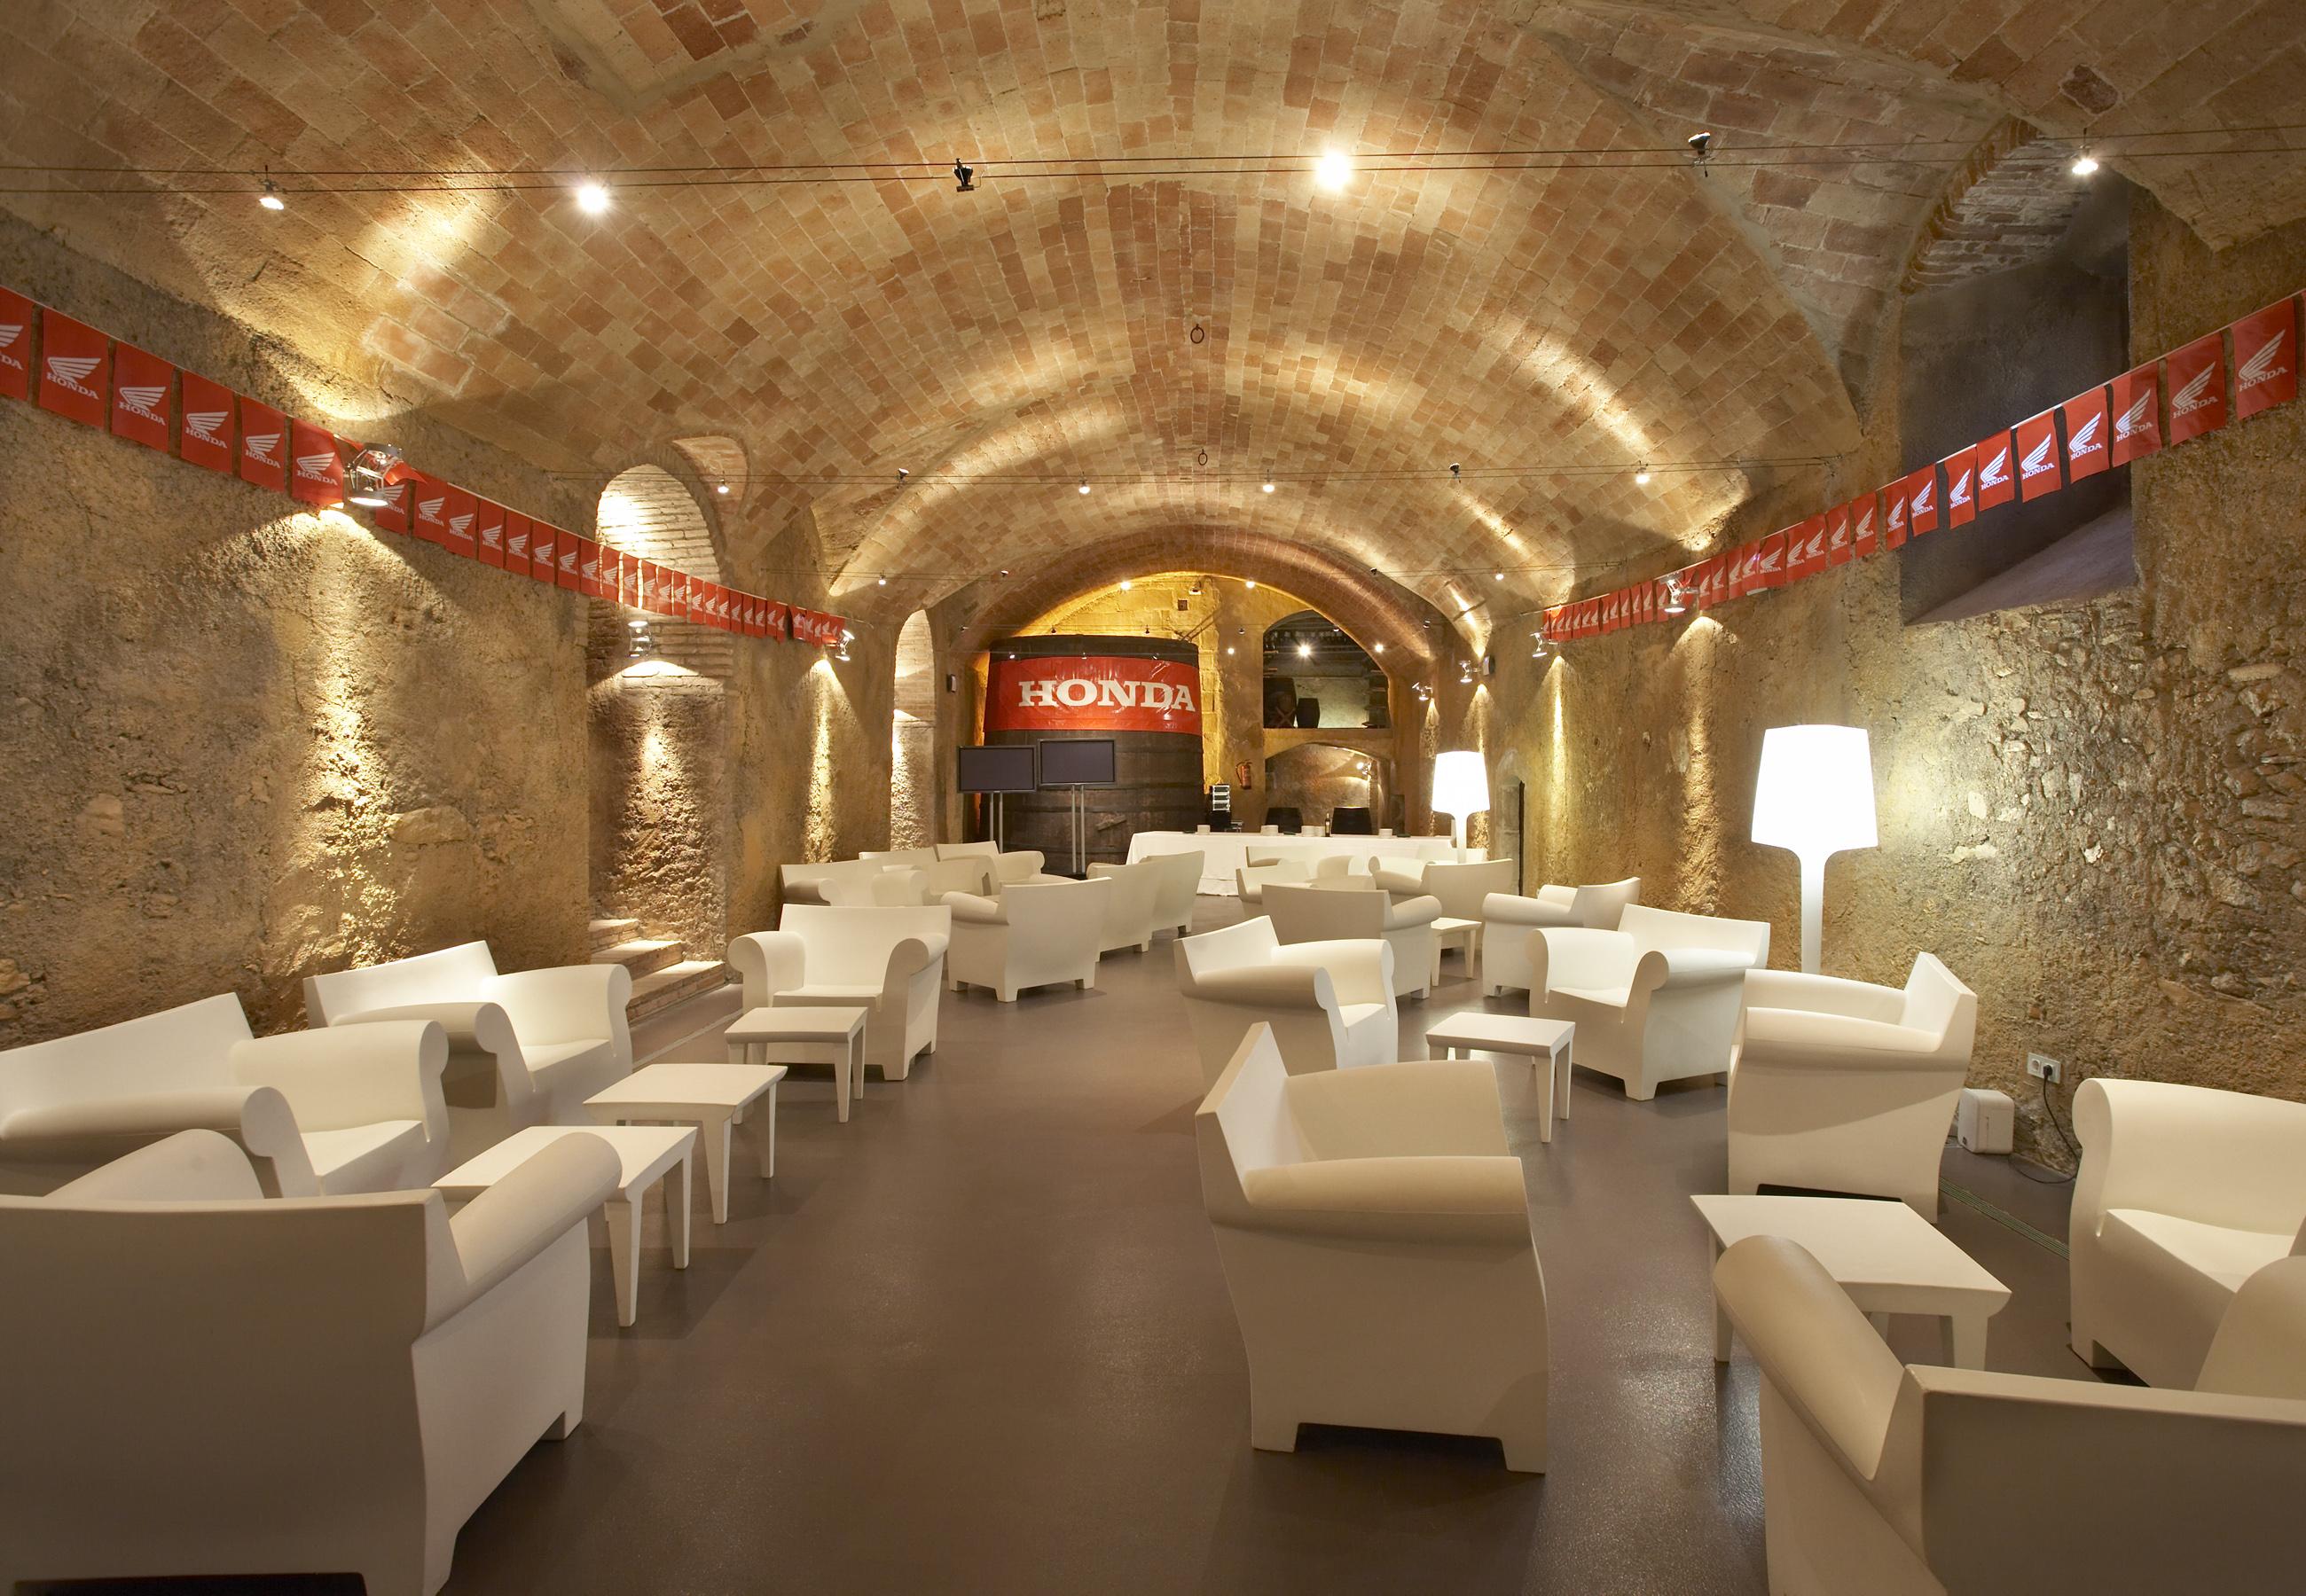 Reuniones de empresa en tarragona la boella tarragona for Actividades de salon